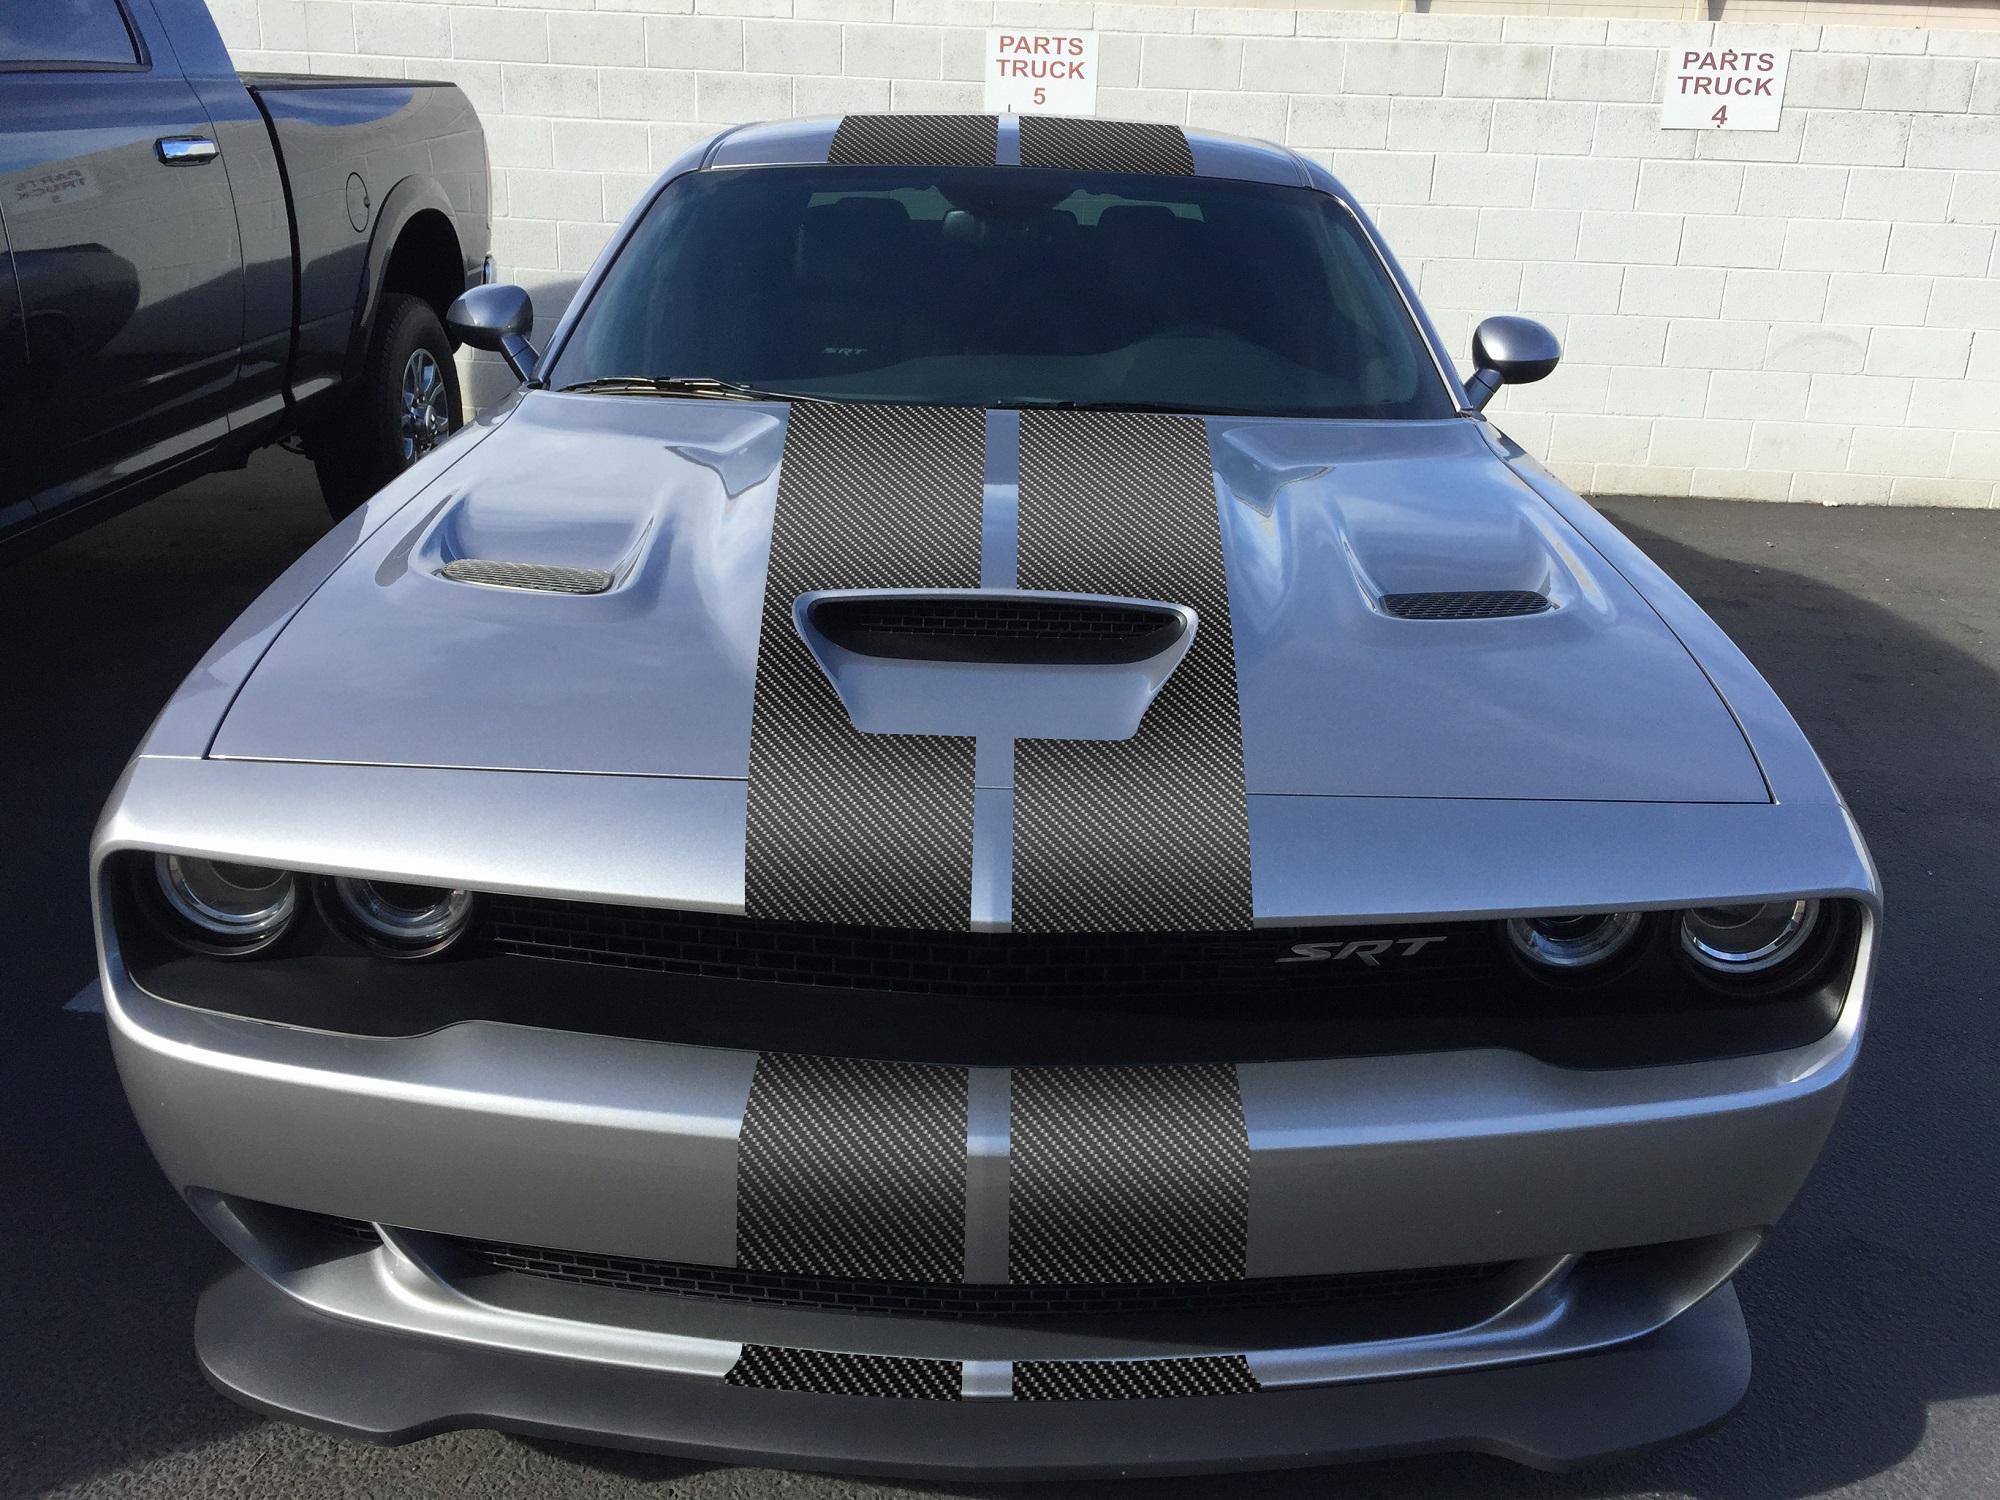 hellcat stripe rally w-out pin stripe.jpg